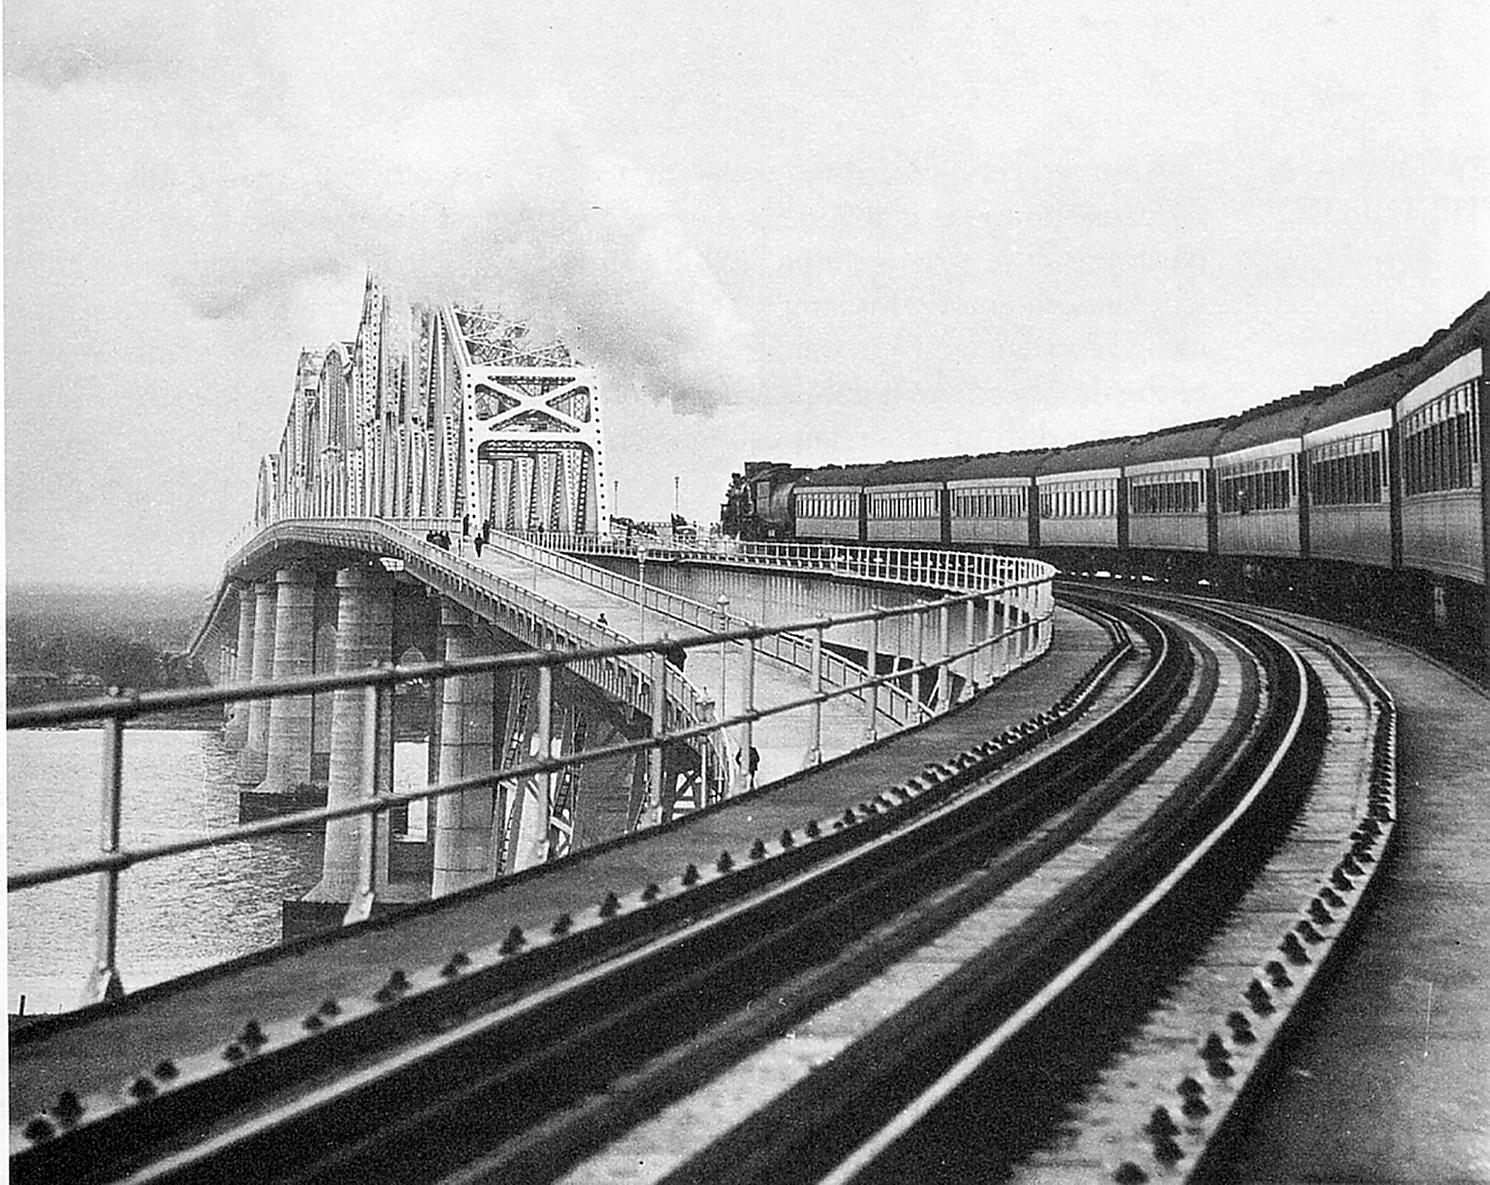 Huey P. Long bridge in 1935